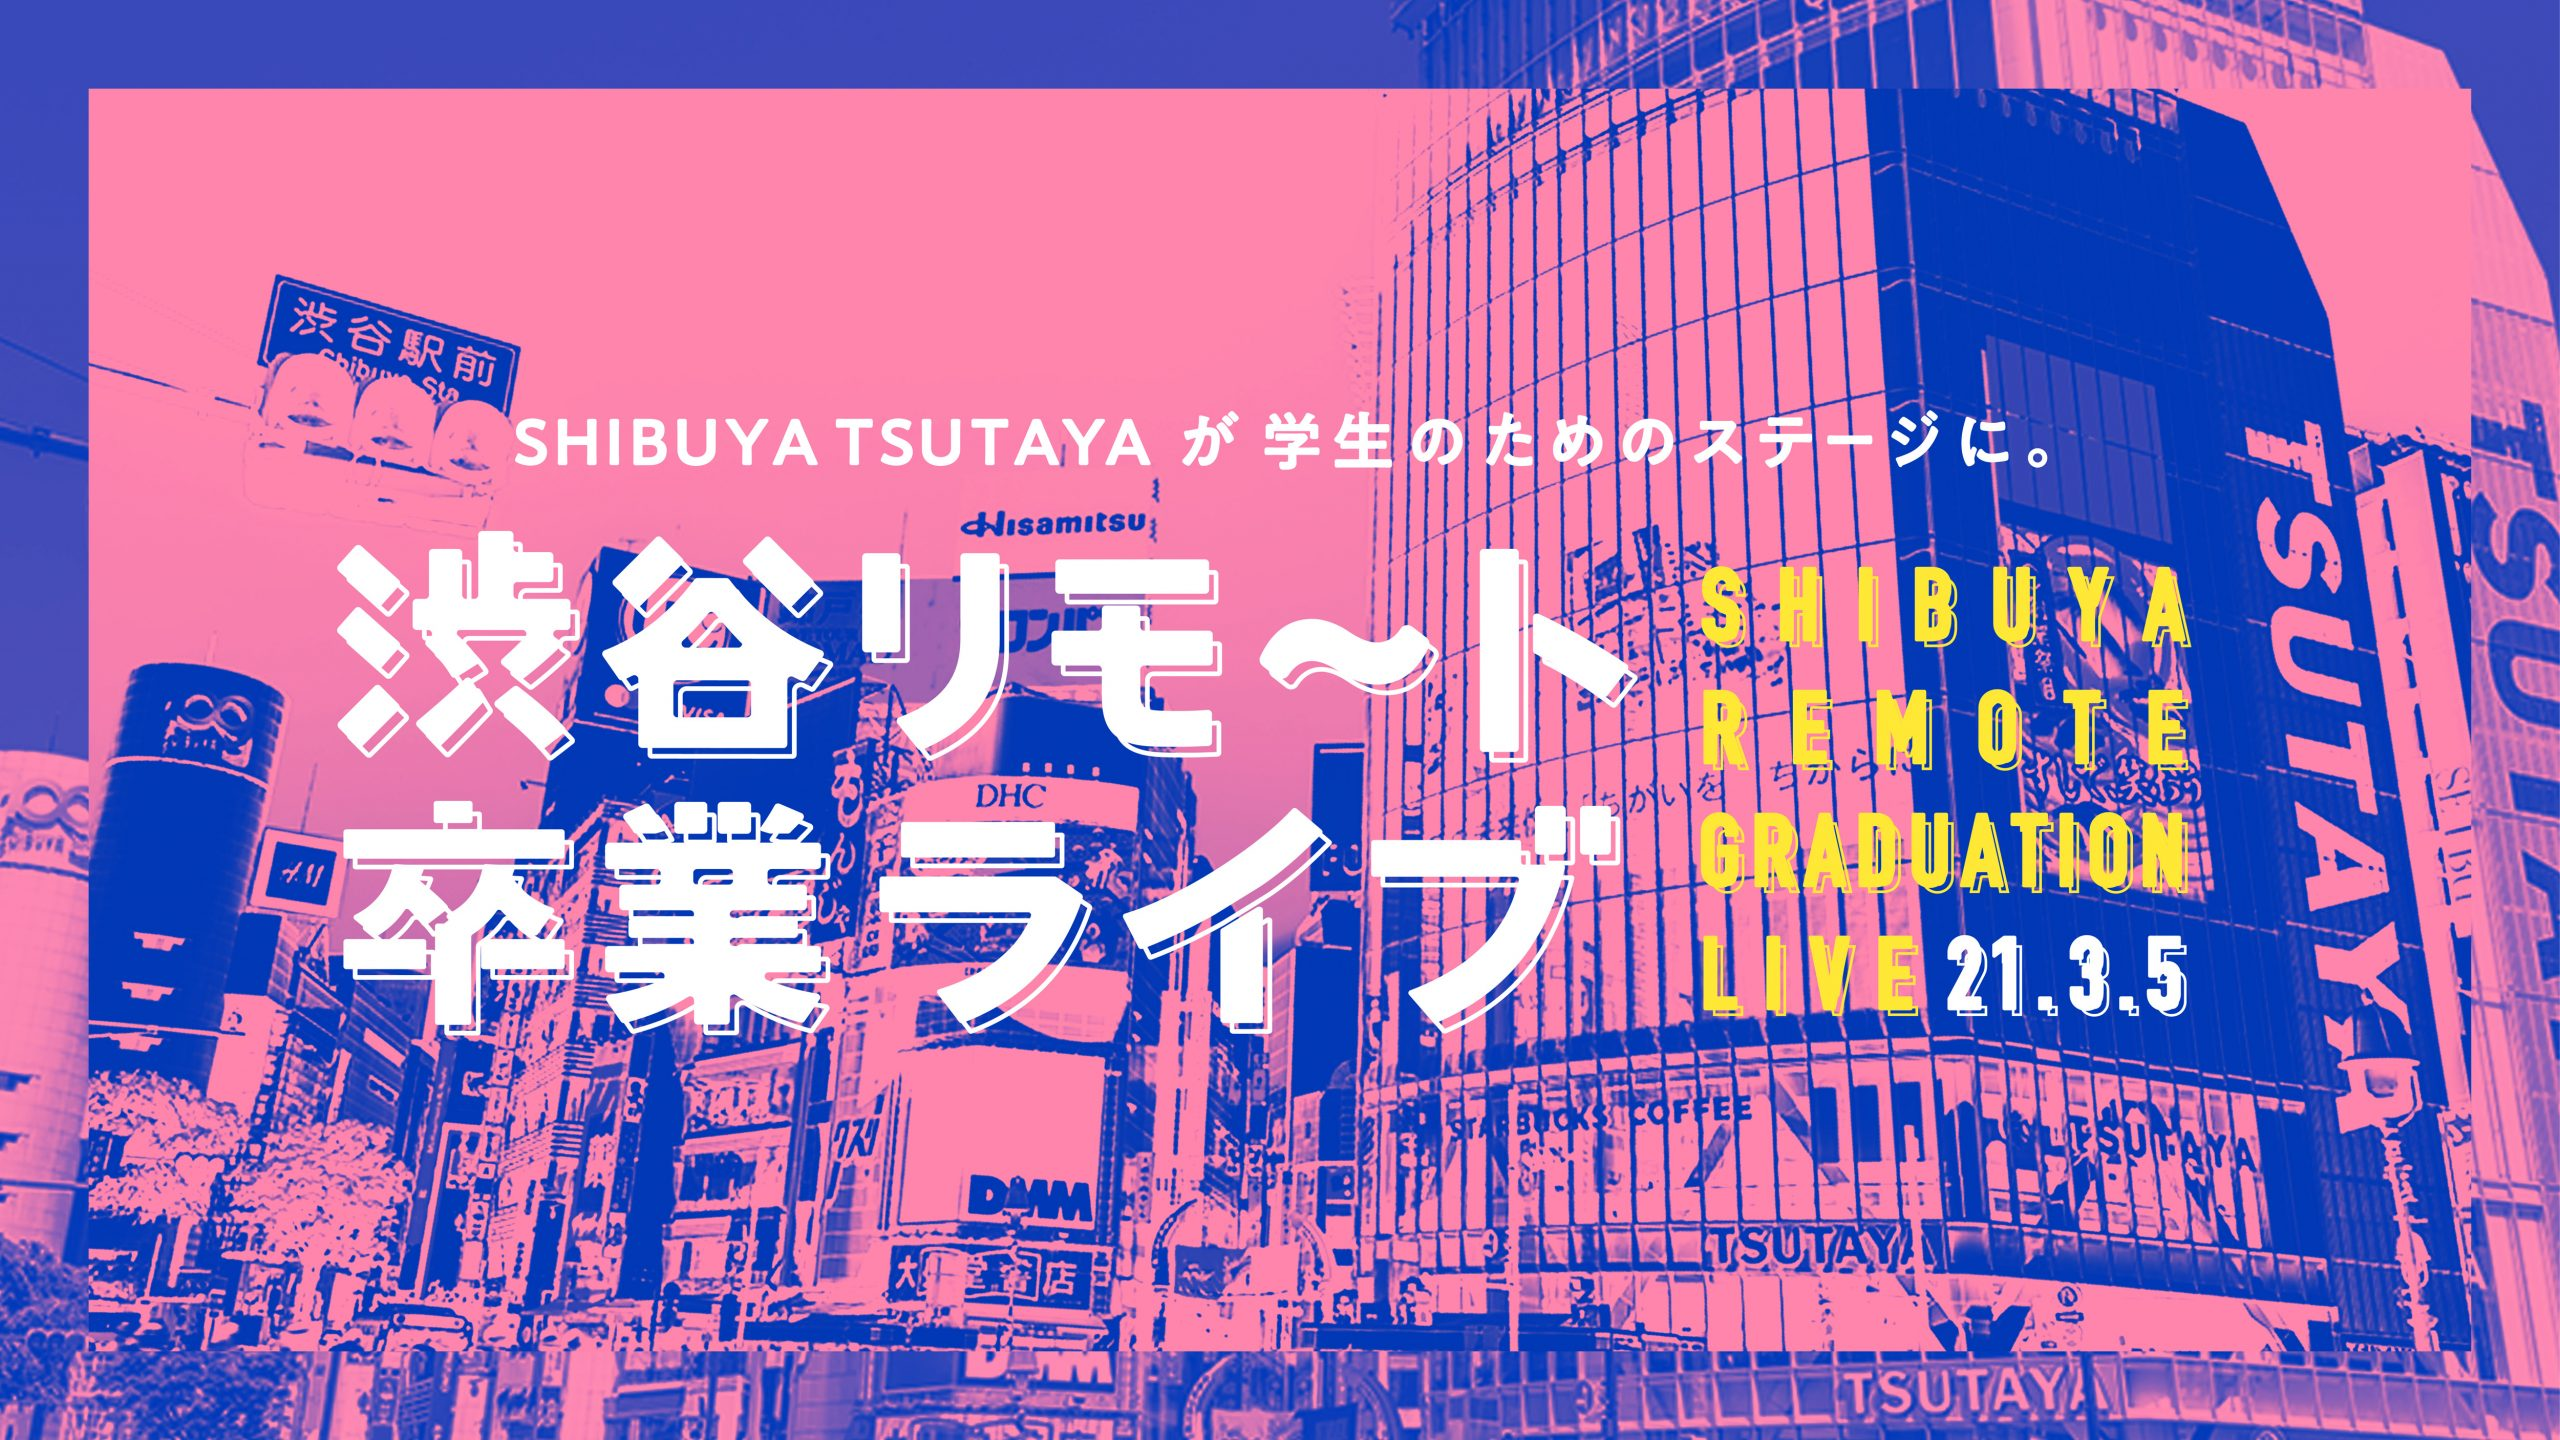 「SHIBUYA TSUTAYA」が、全国の学生バンドグループの思いをのせたライブ会場に